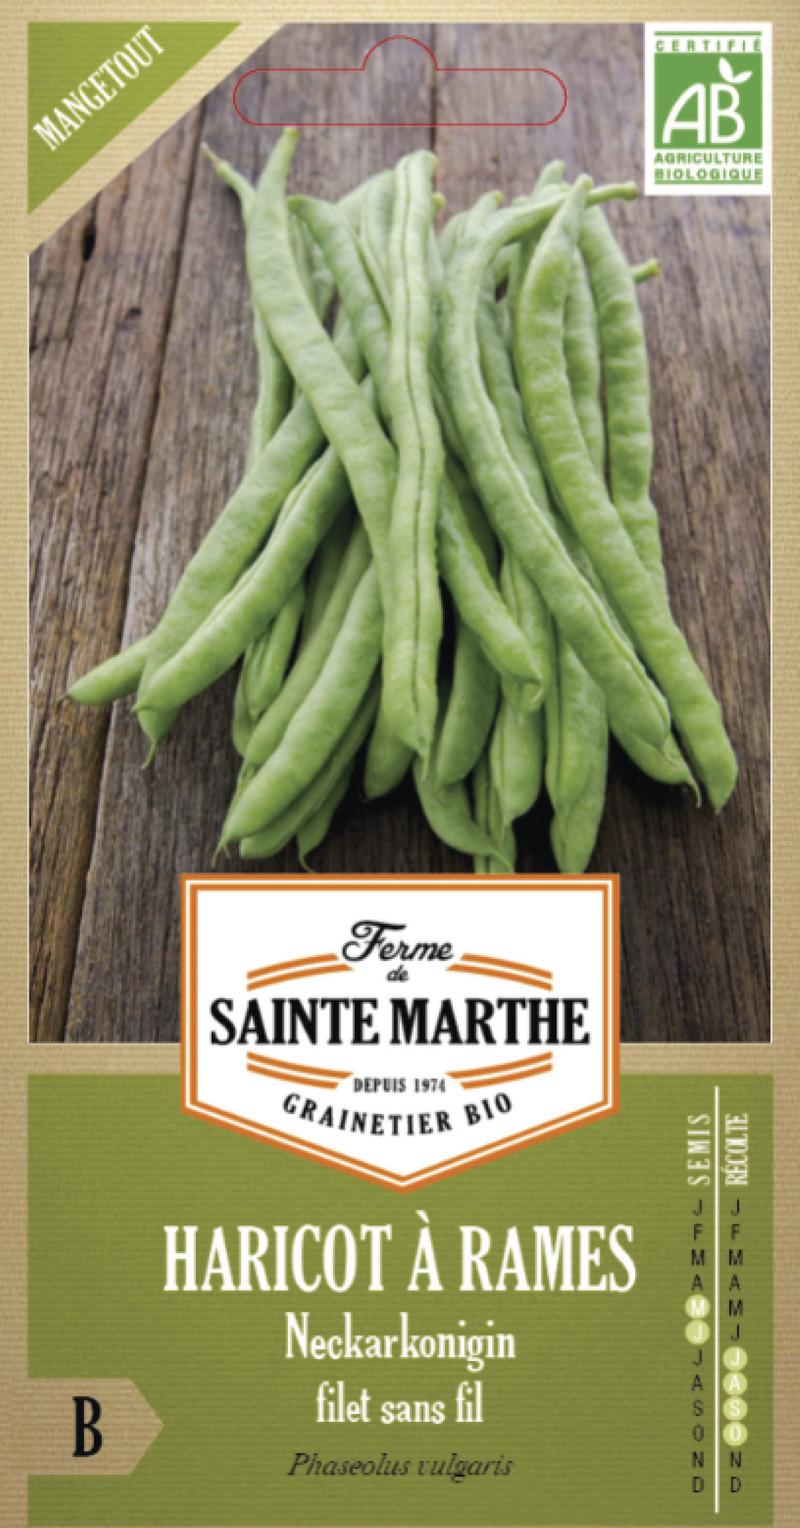 haricot a rames neckarkonigin mangetout bio la ferme de sainte marthe graine semence potager boite - Voir en grand